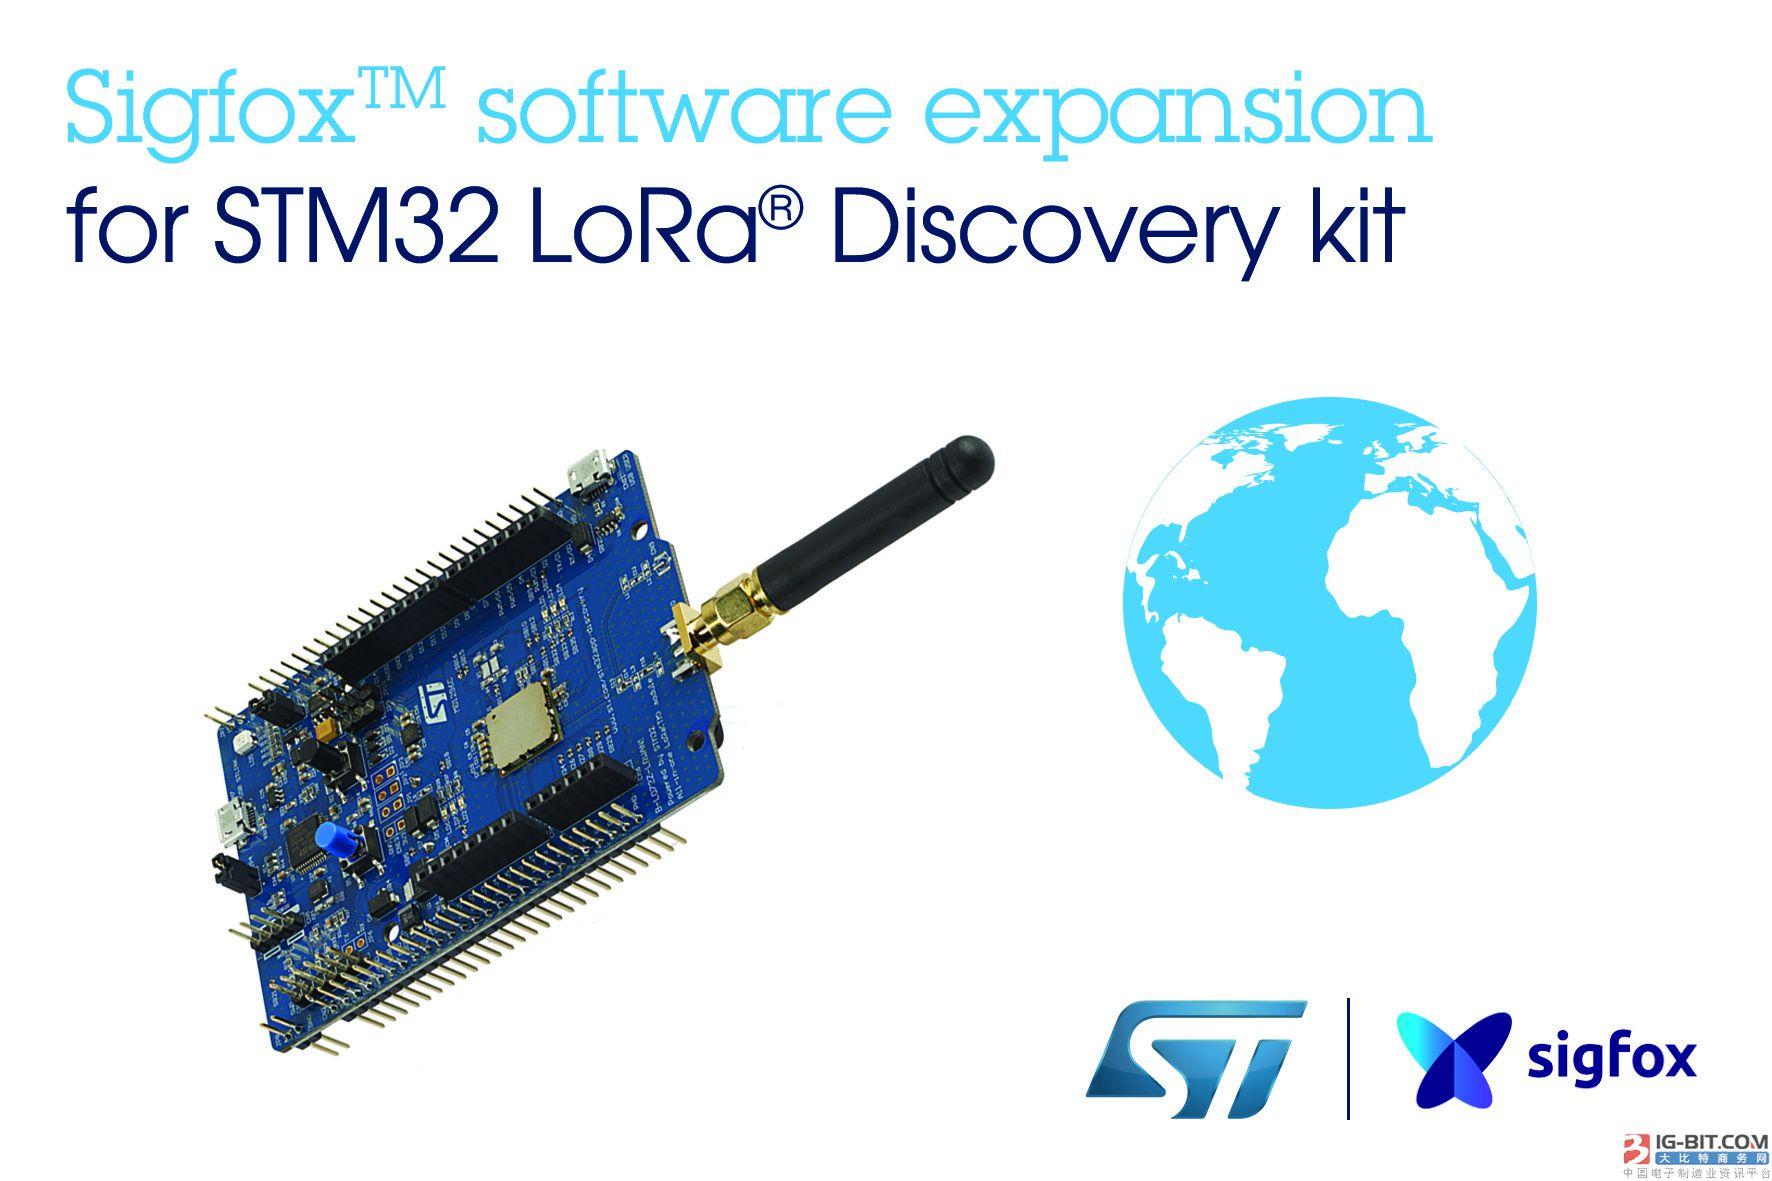 Sigfox™ STM32微控制器为IoT设备开发人员扩大设备连接选择